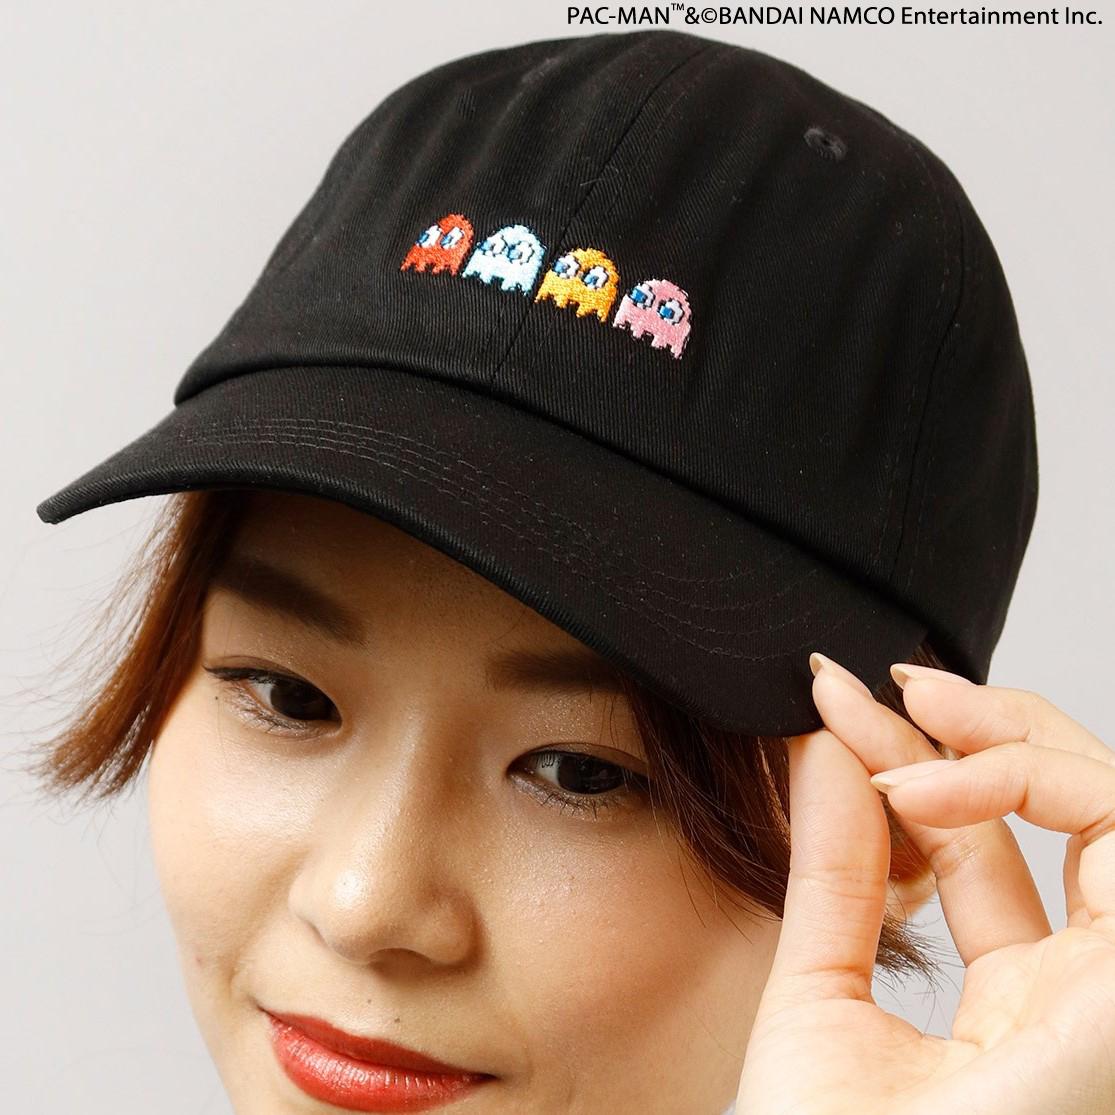 PAC-MANコラボ!ゴースト刺繍CAP